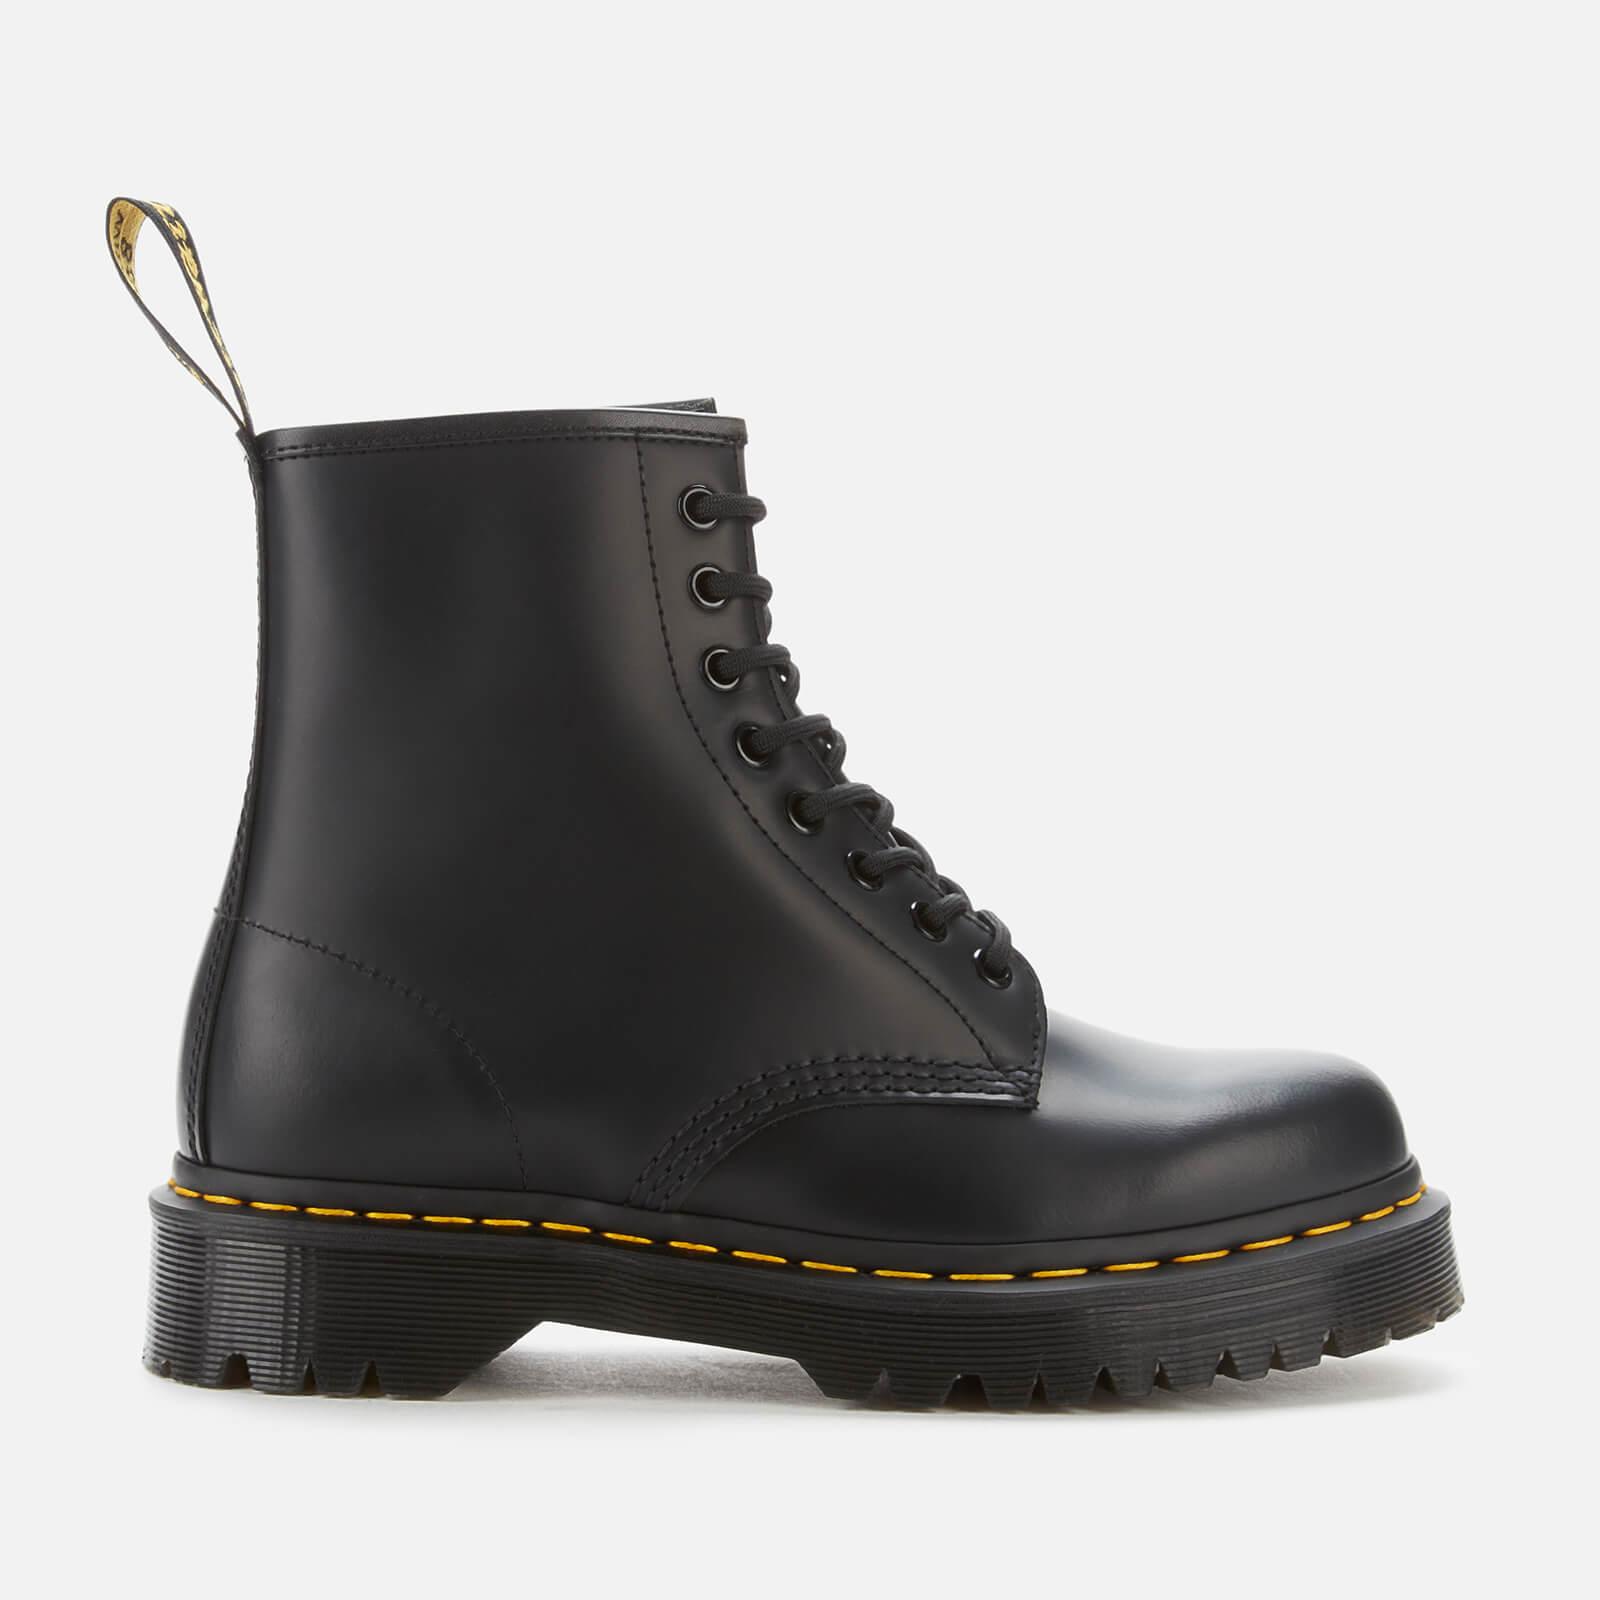 Dr. Martens 1460 Bex Smooth Leather 8-Eye Boots - Black - Uk 9